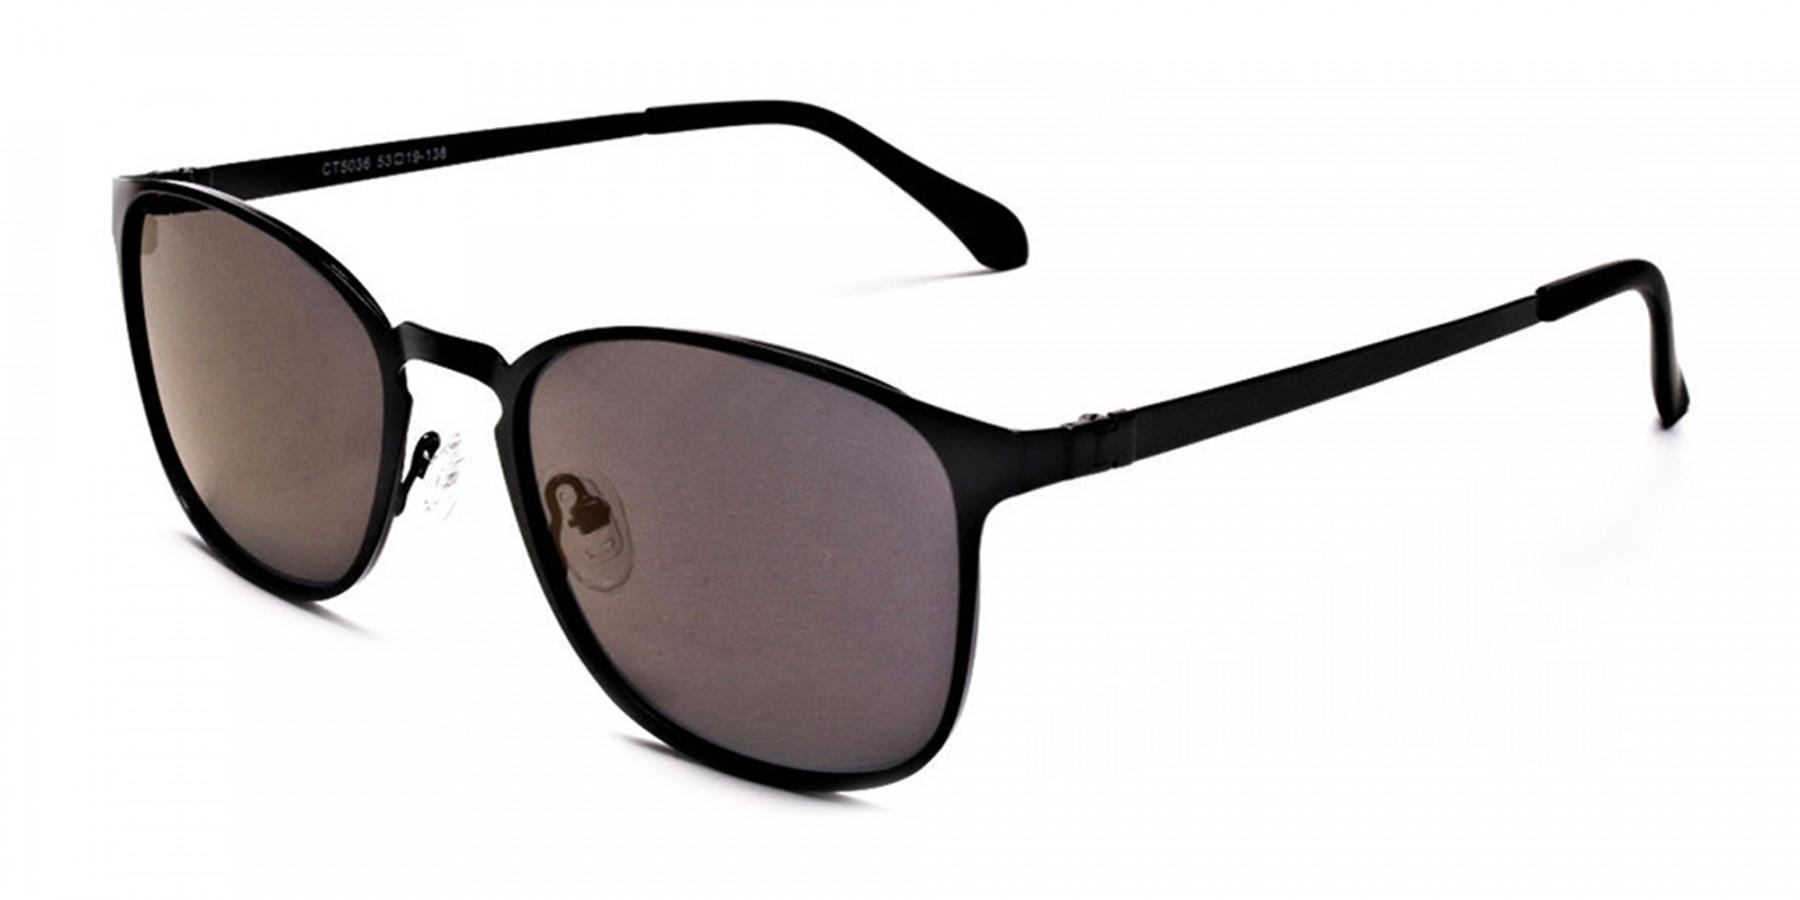 Purple and Brown Round Sunglasses - 2